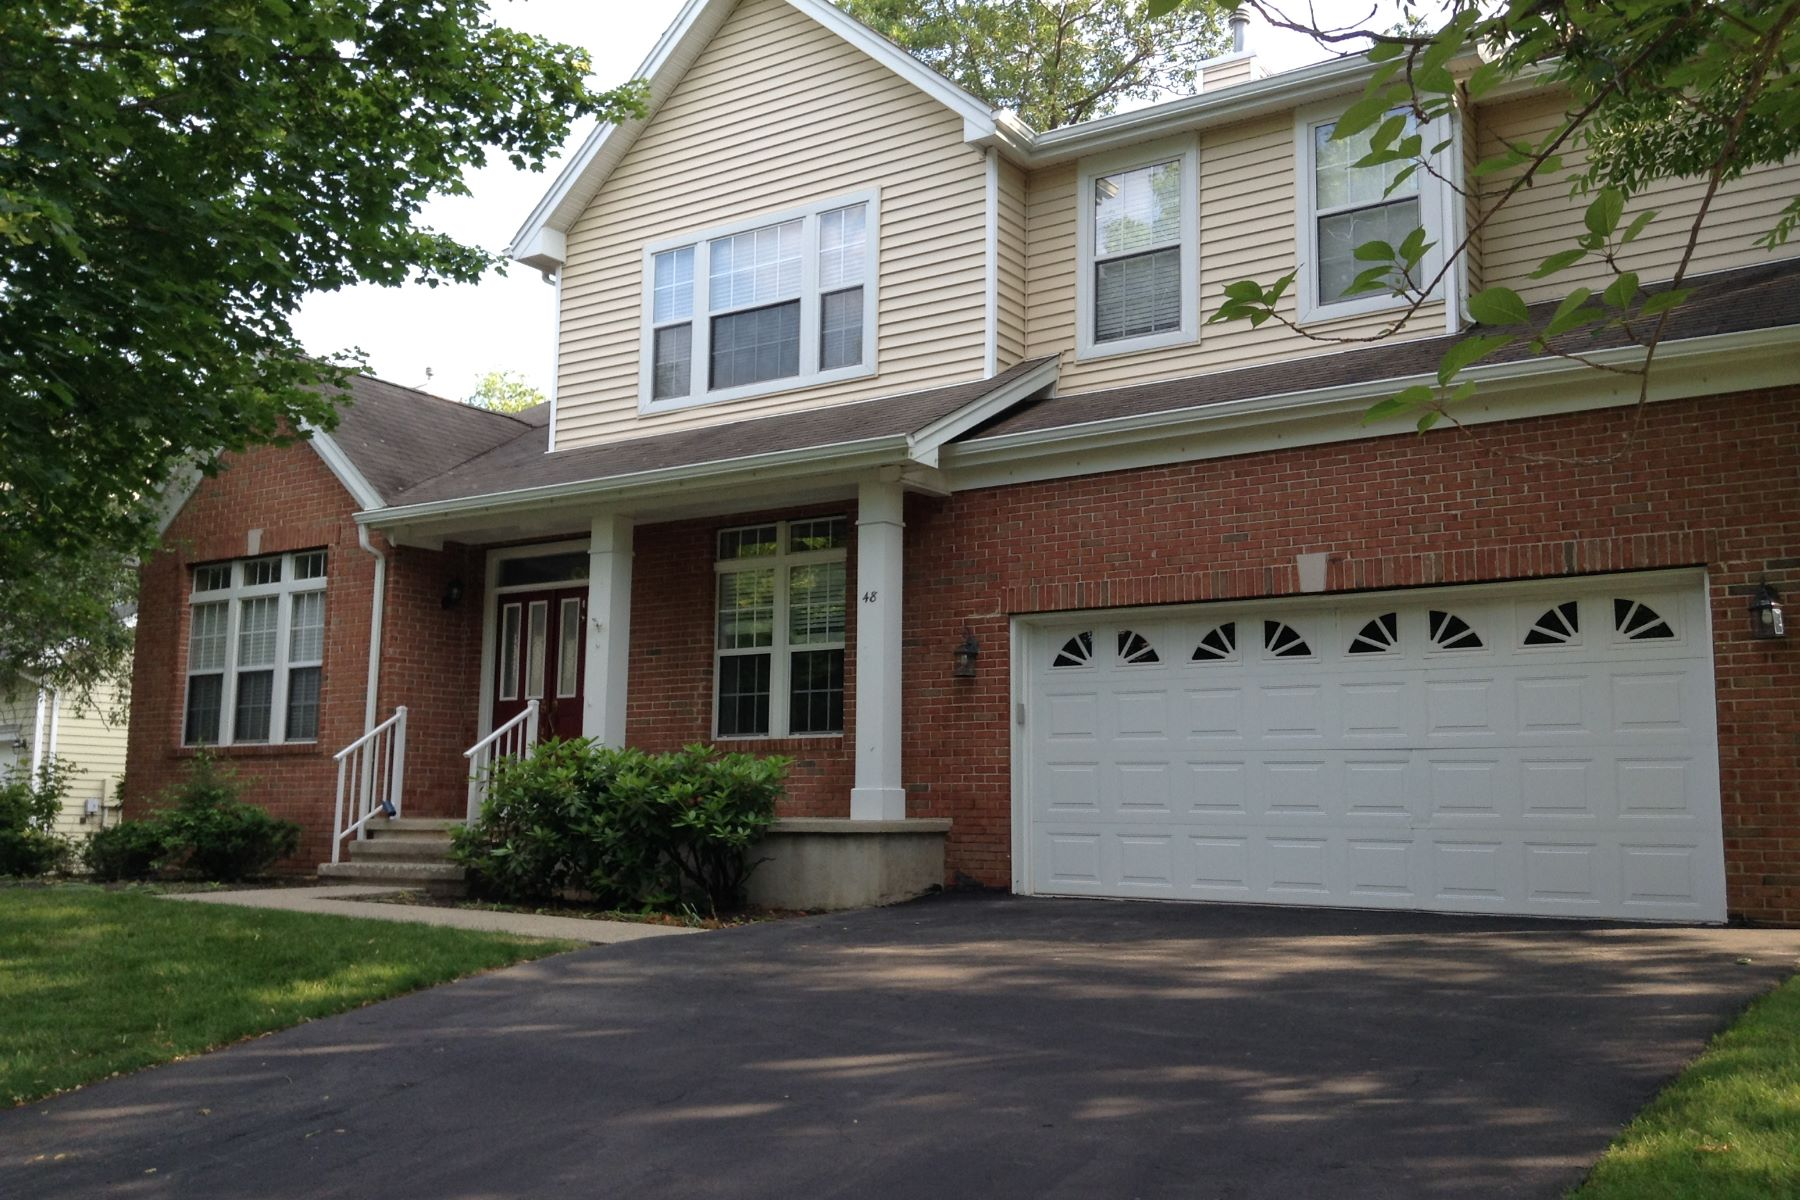 Single Family Home for Rent at Bright, Sunny Carlisle 8 Model 48 Landau Road Basking Ridge, New Jersey 07920 United States